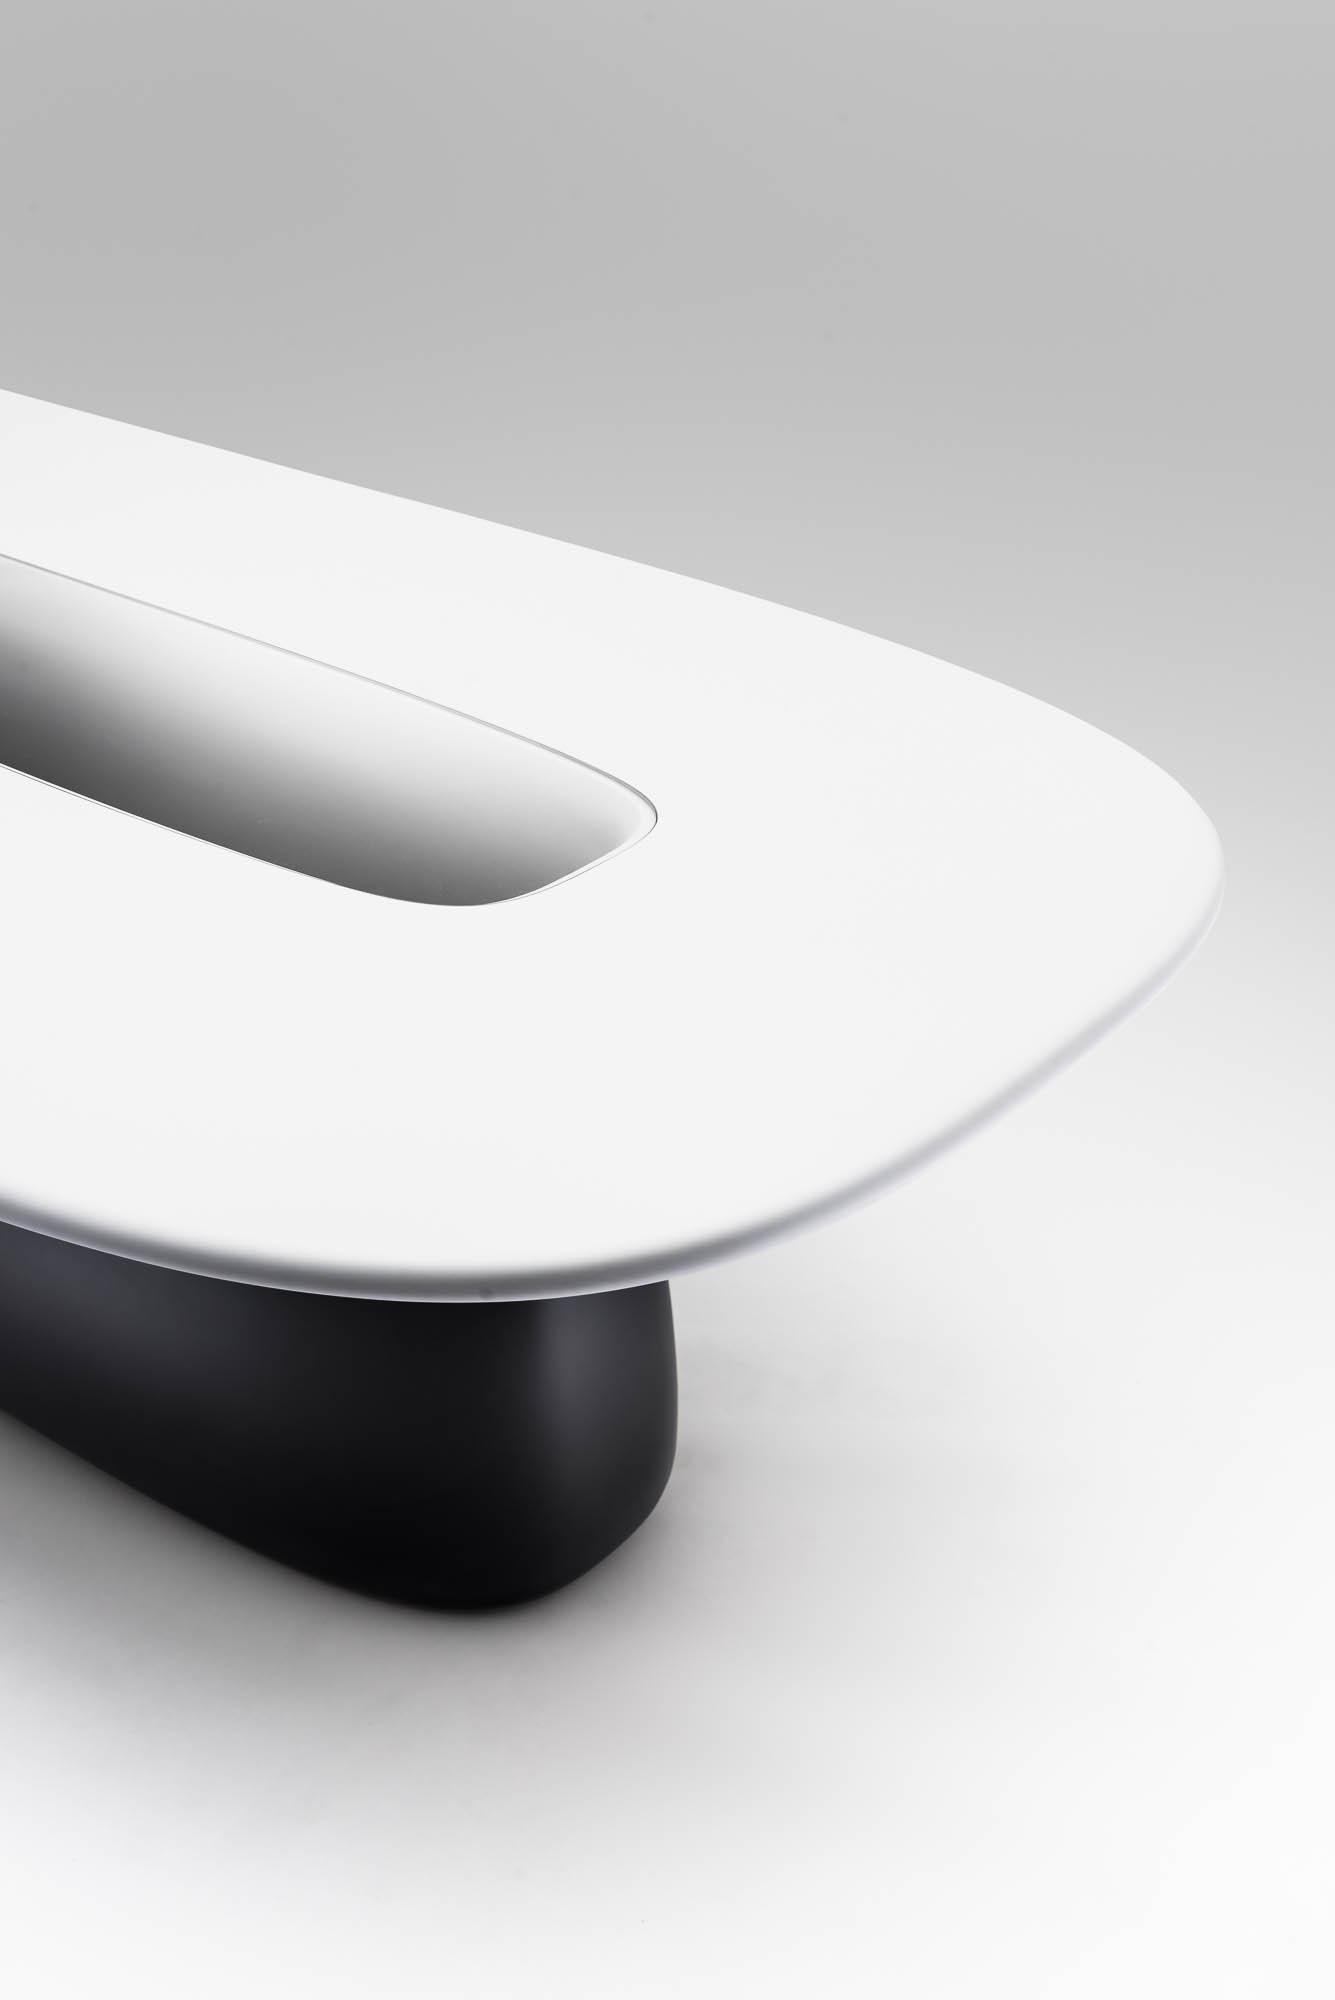 3. Dining Table 'Introspection'.jpg